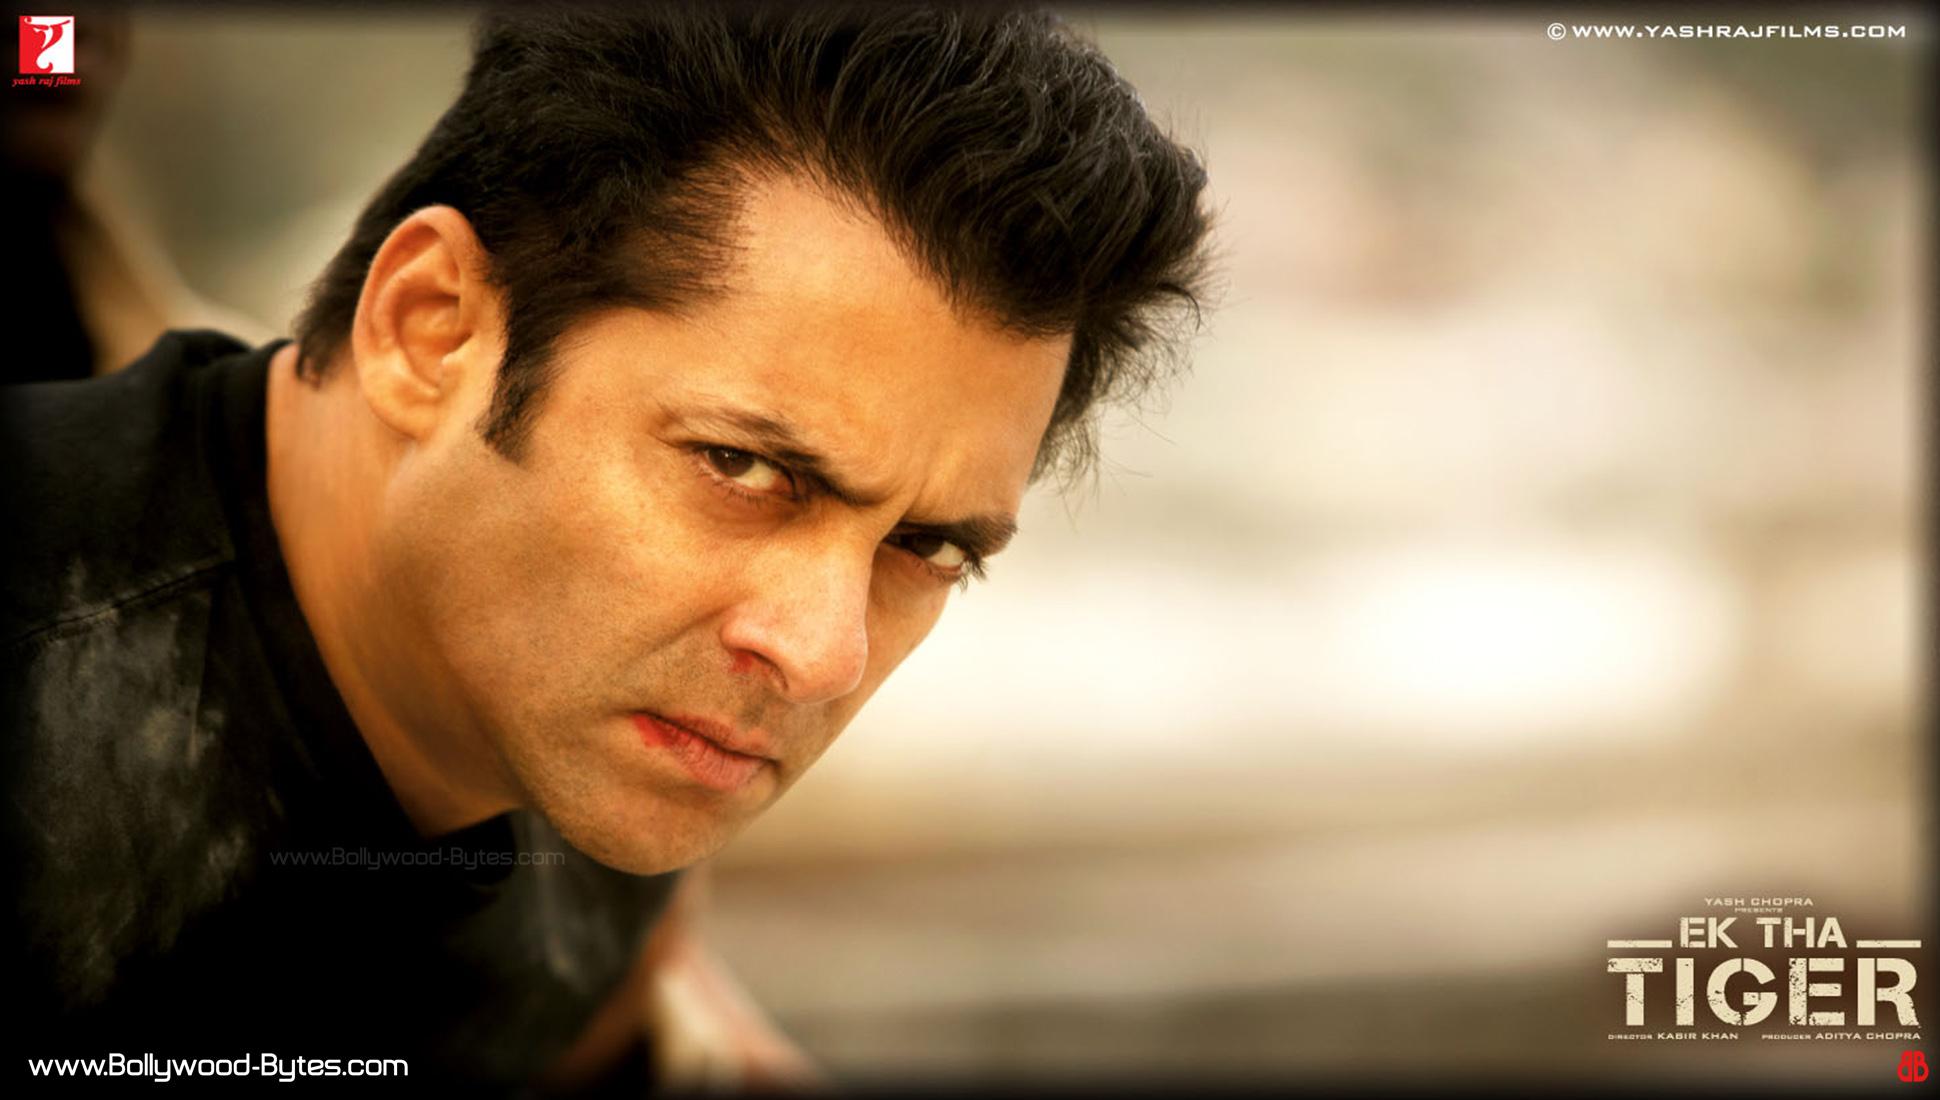 http://3.bp.blogspot.com/-mq2JVmUfKrY/UArjTHrgs_I/AAAAAAAAL_M/lAWuieABmJE/s1940/Ek-Tha-Tiger-Salman-Khan-HD-Wallpaper-29.jpg